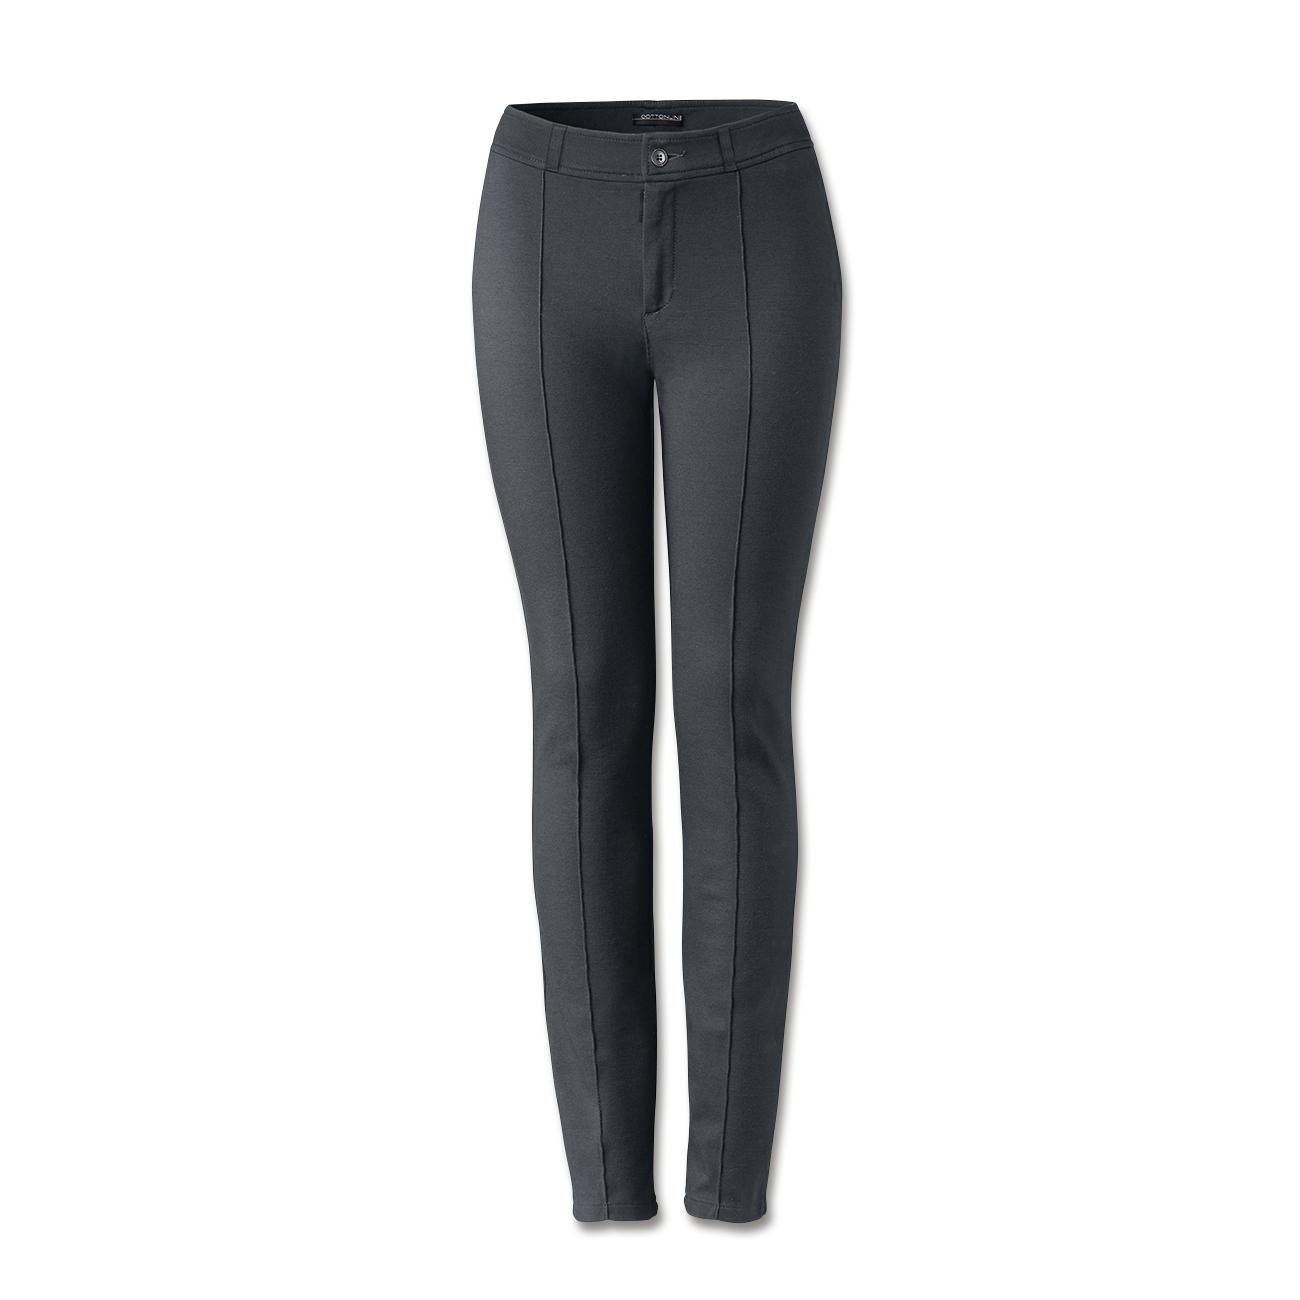 cotton line edel leggings 3 jahre garantie pro idee. Black Bedroom Furniture Sets. Home Design Ideas